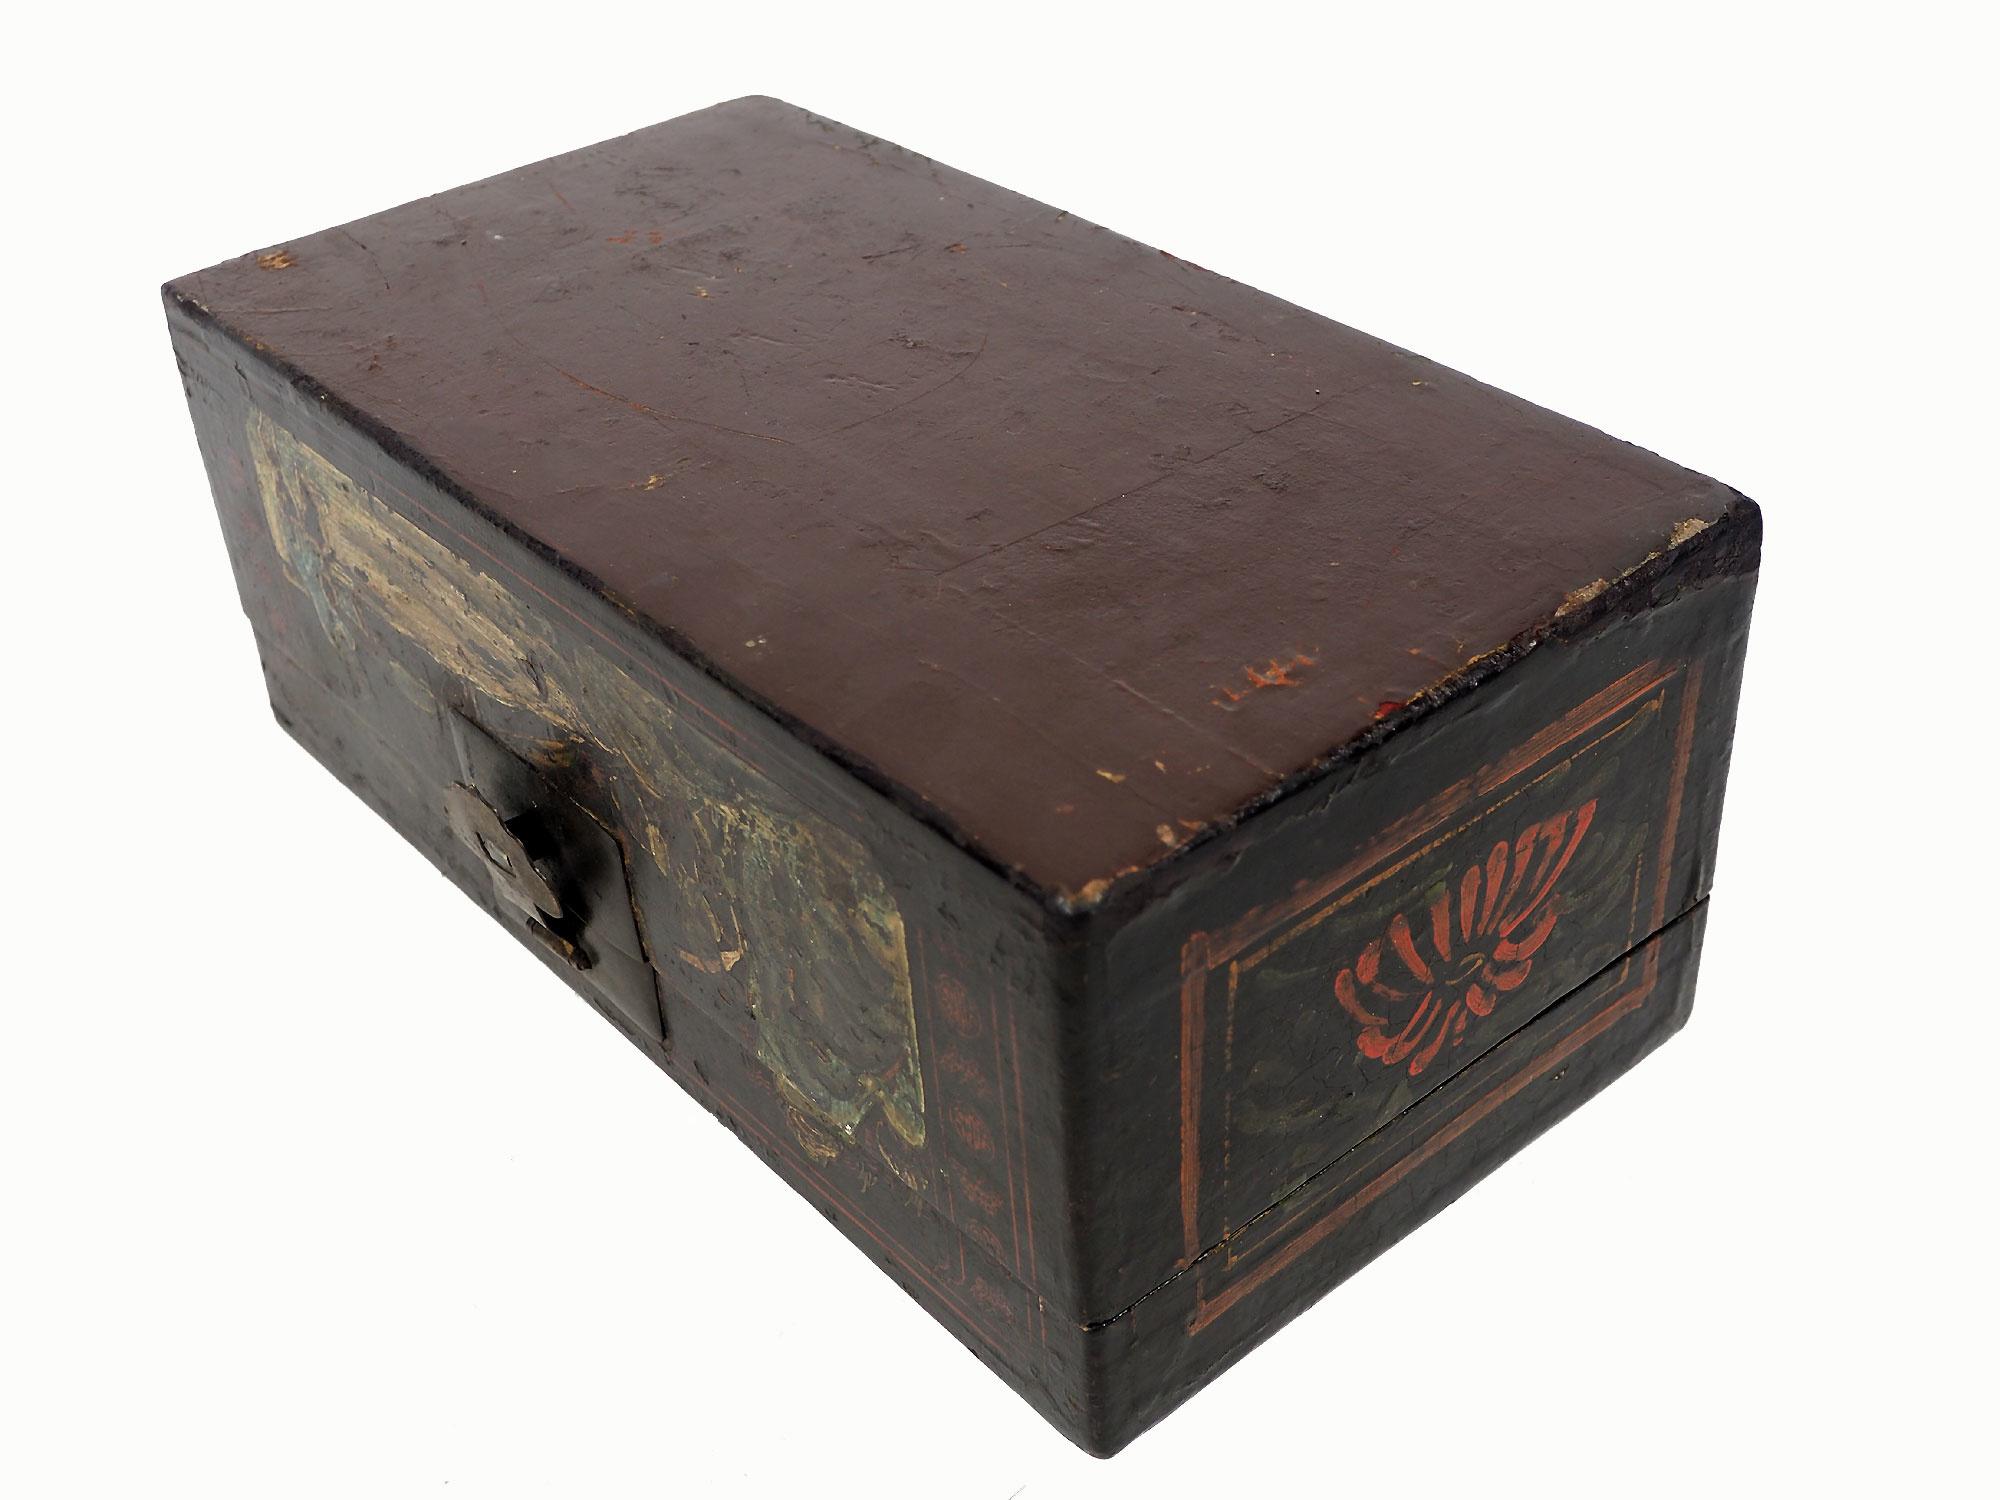 Antike Japan/China Holz Kiste schatulle BLAK